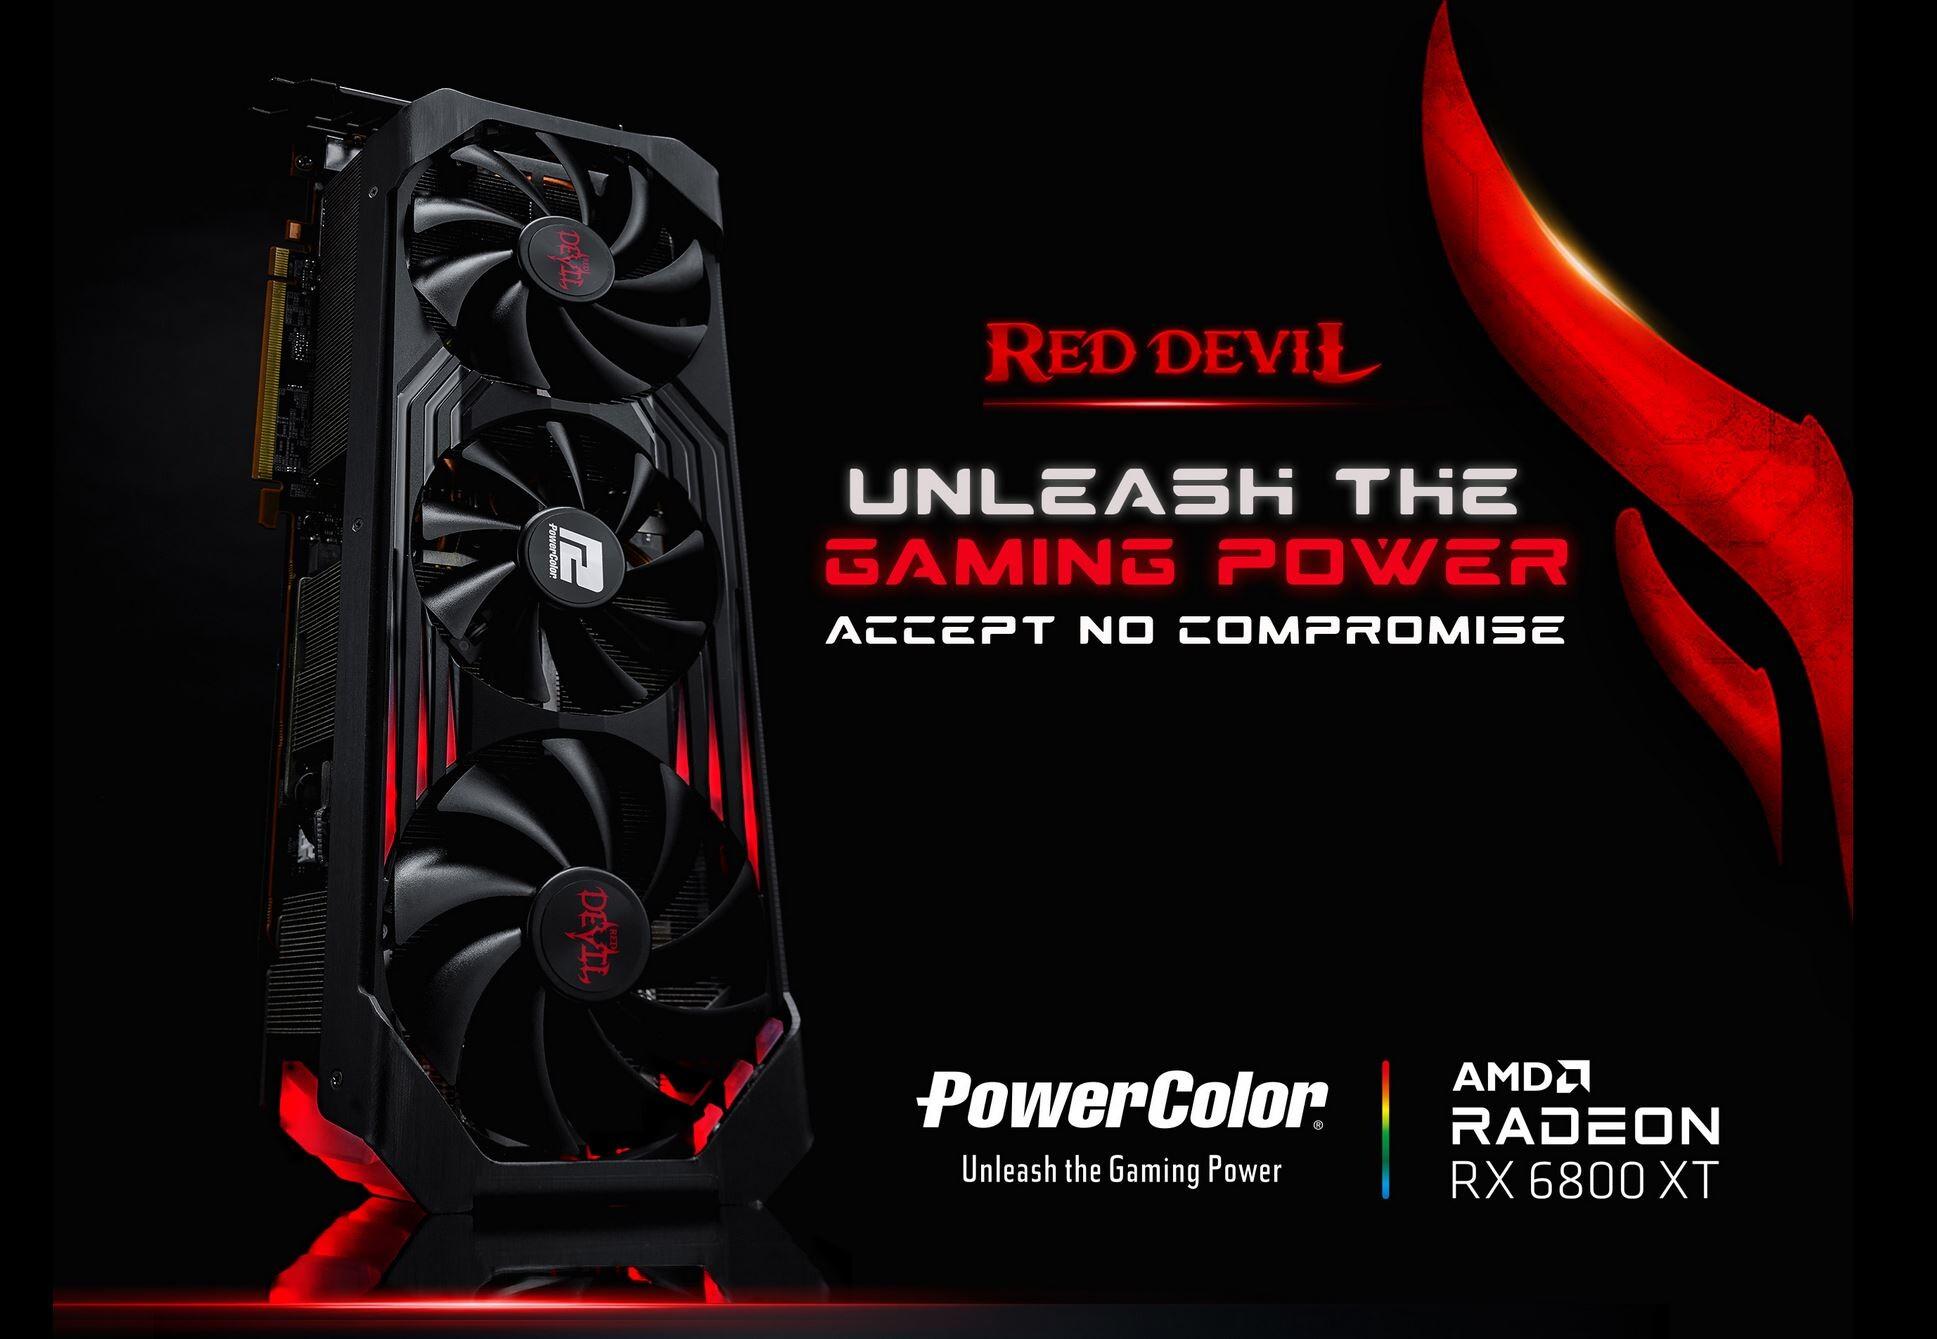 PowerColor تطلق رسمياً بطاقات Red Devil و Red Dragon لسلسلة RX 6800